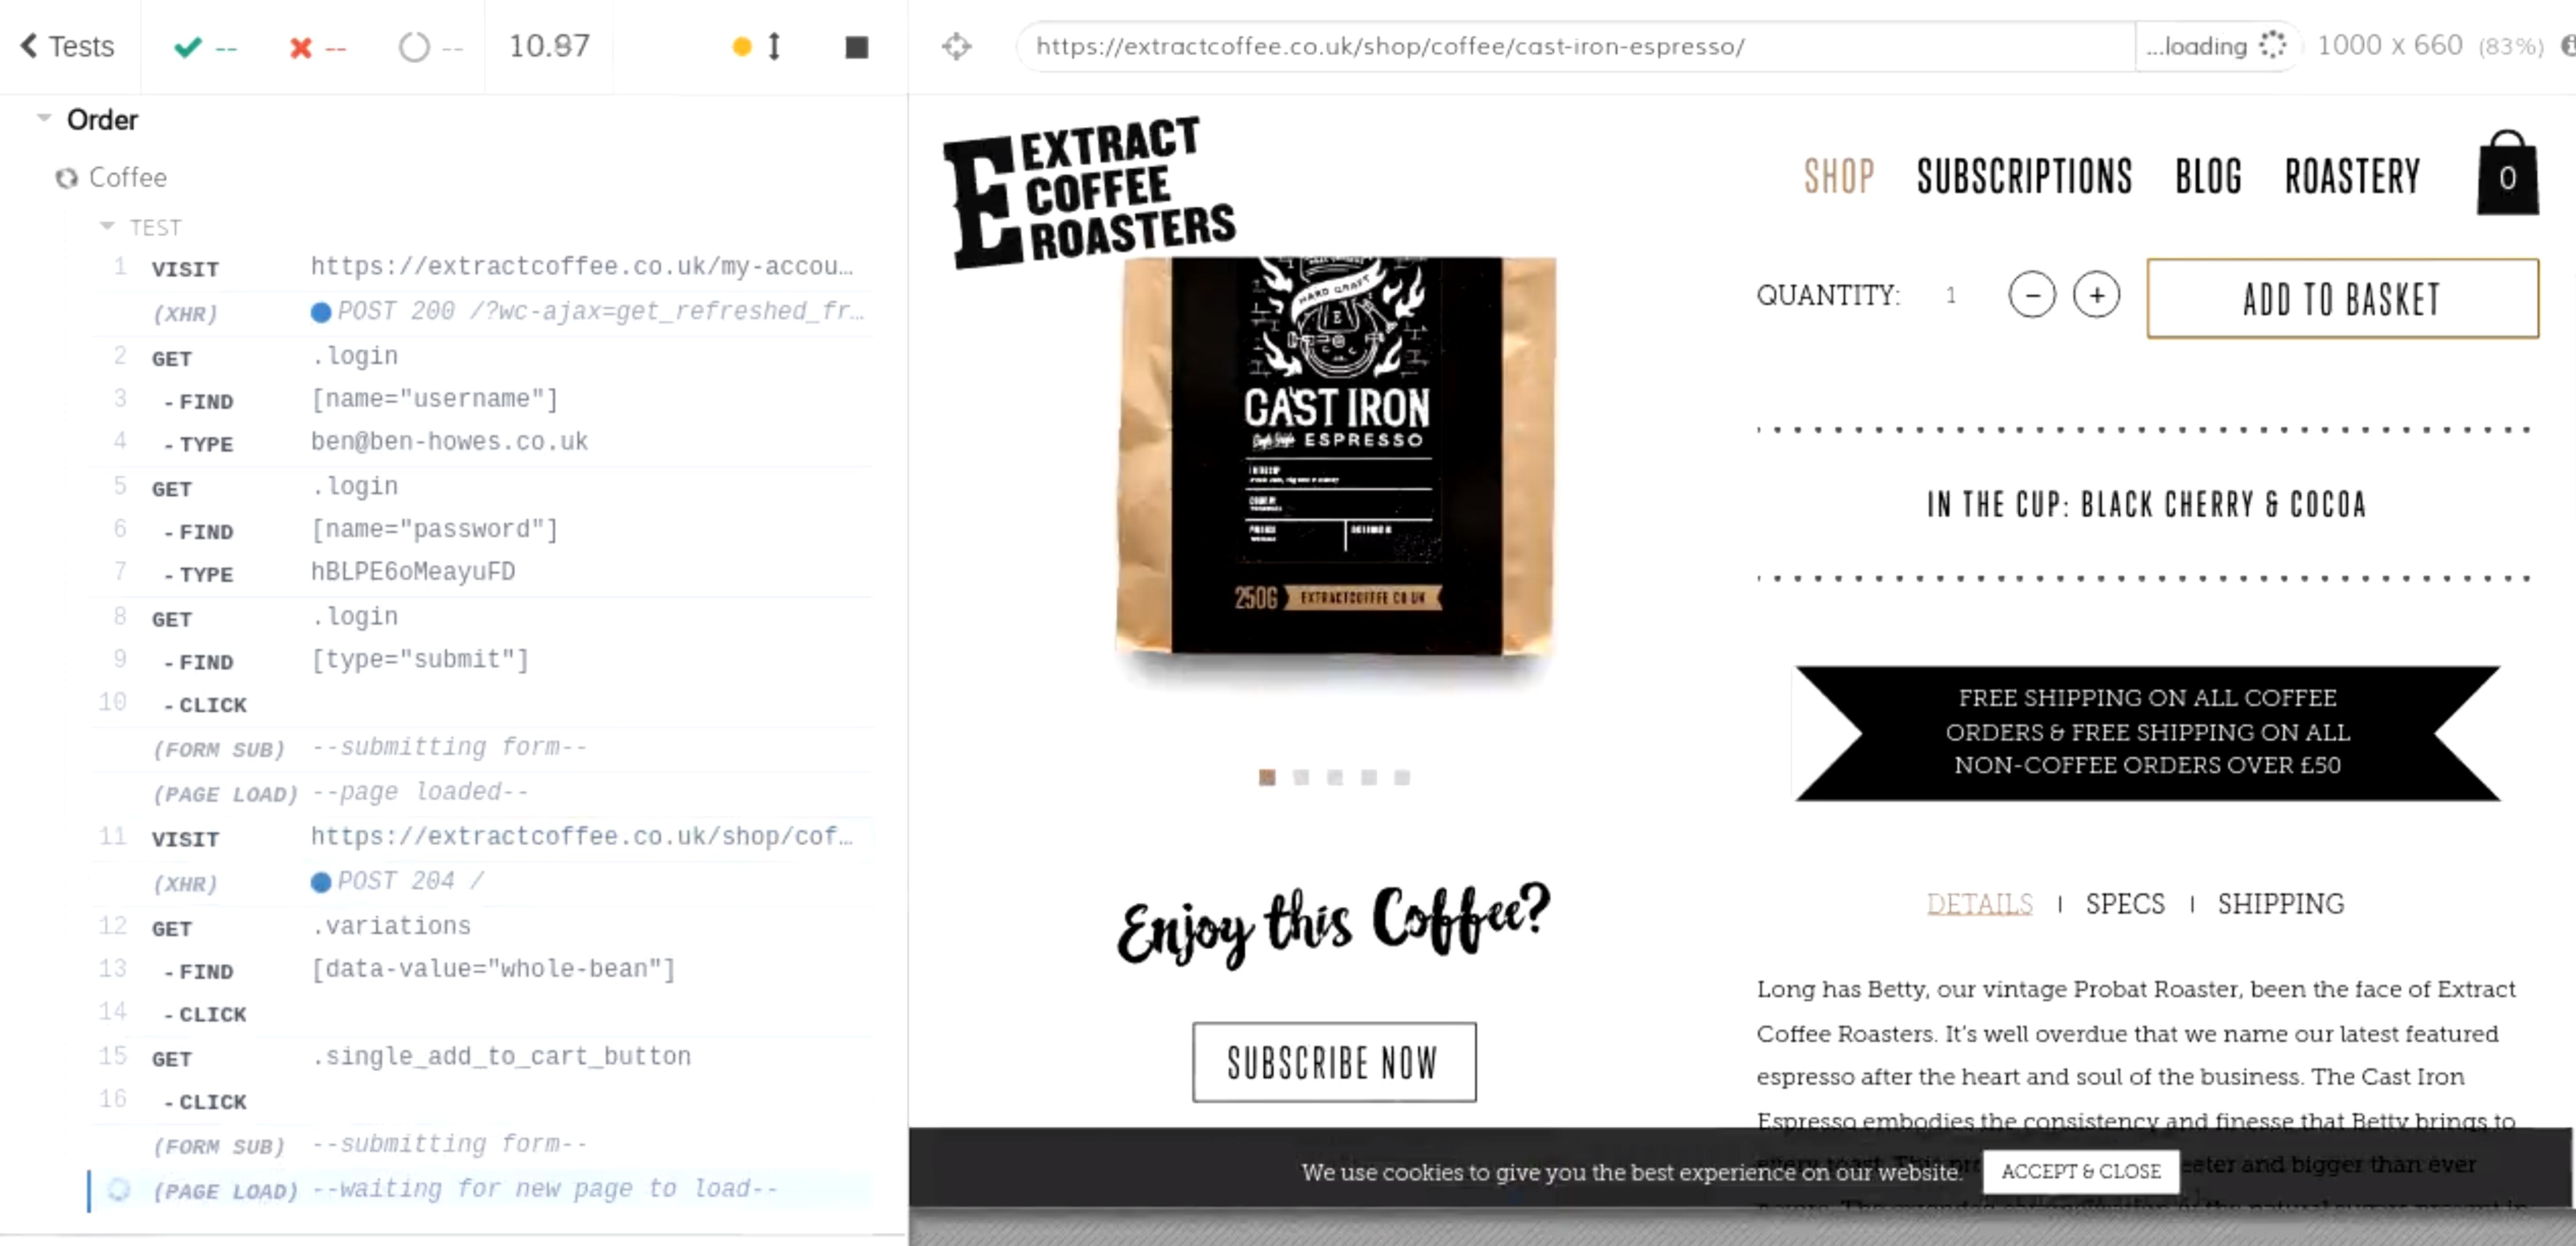 Auto coffee order